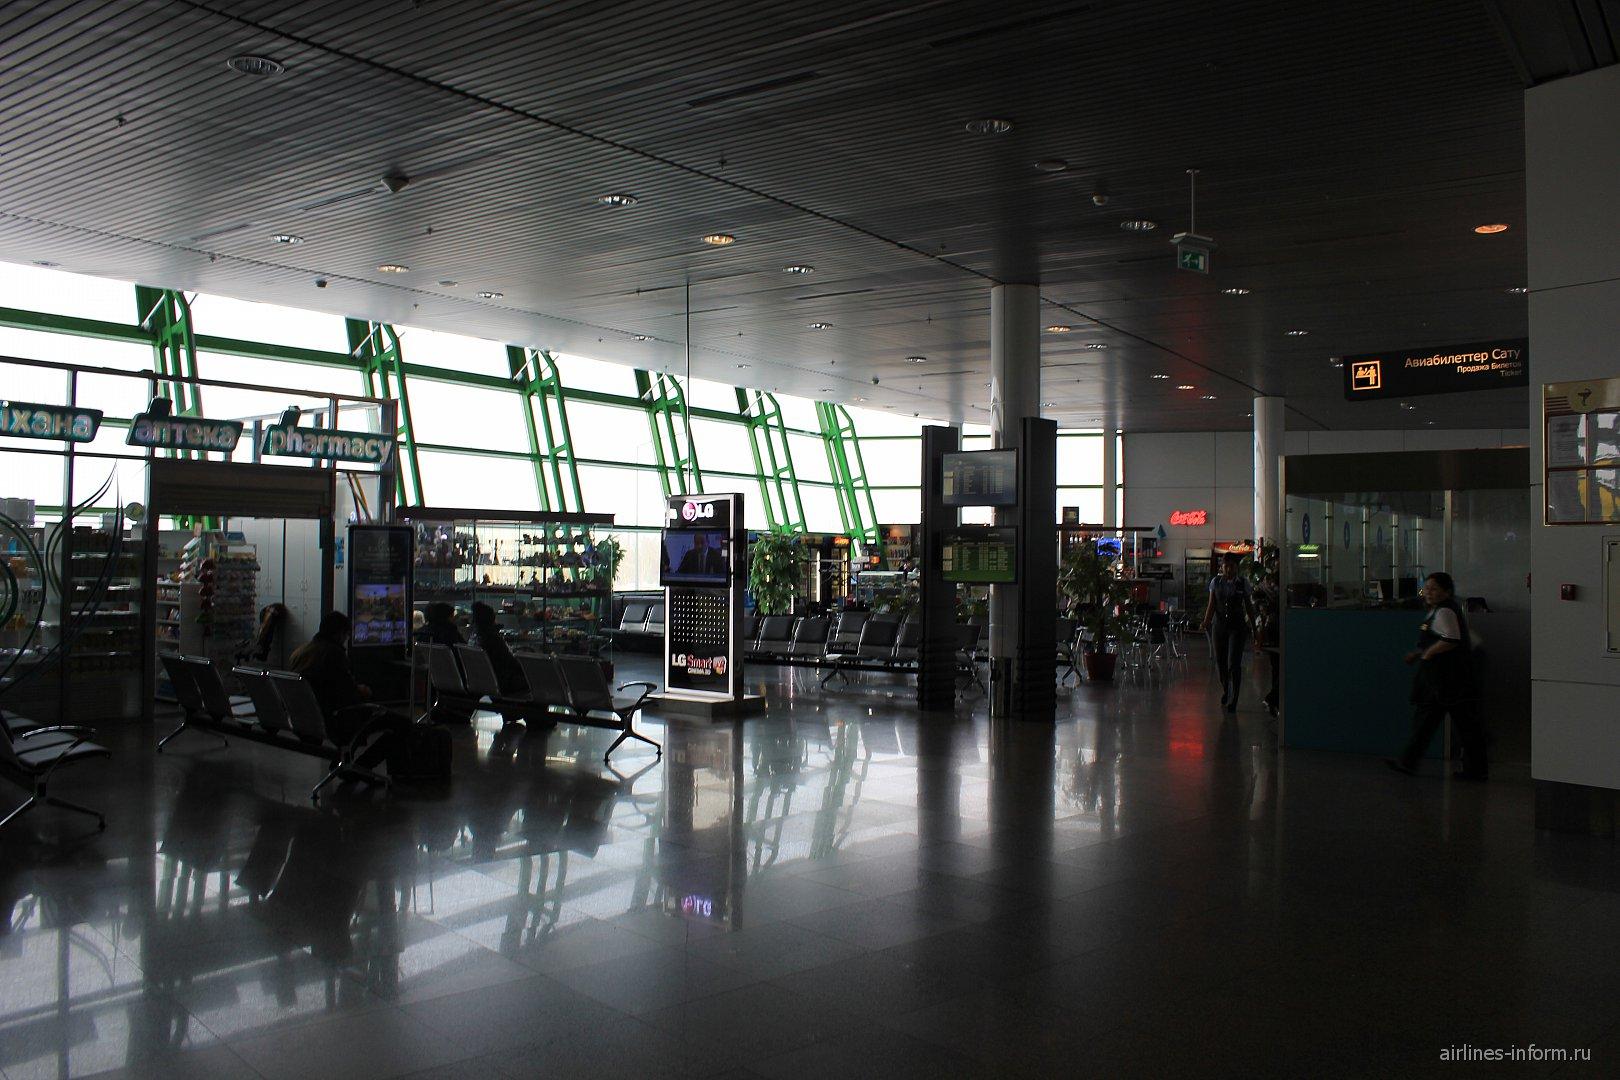 Зал ожидания перед выходом на посадку в аэропорту Астана